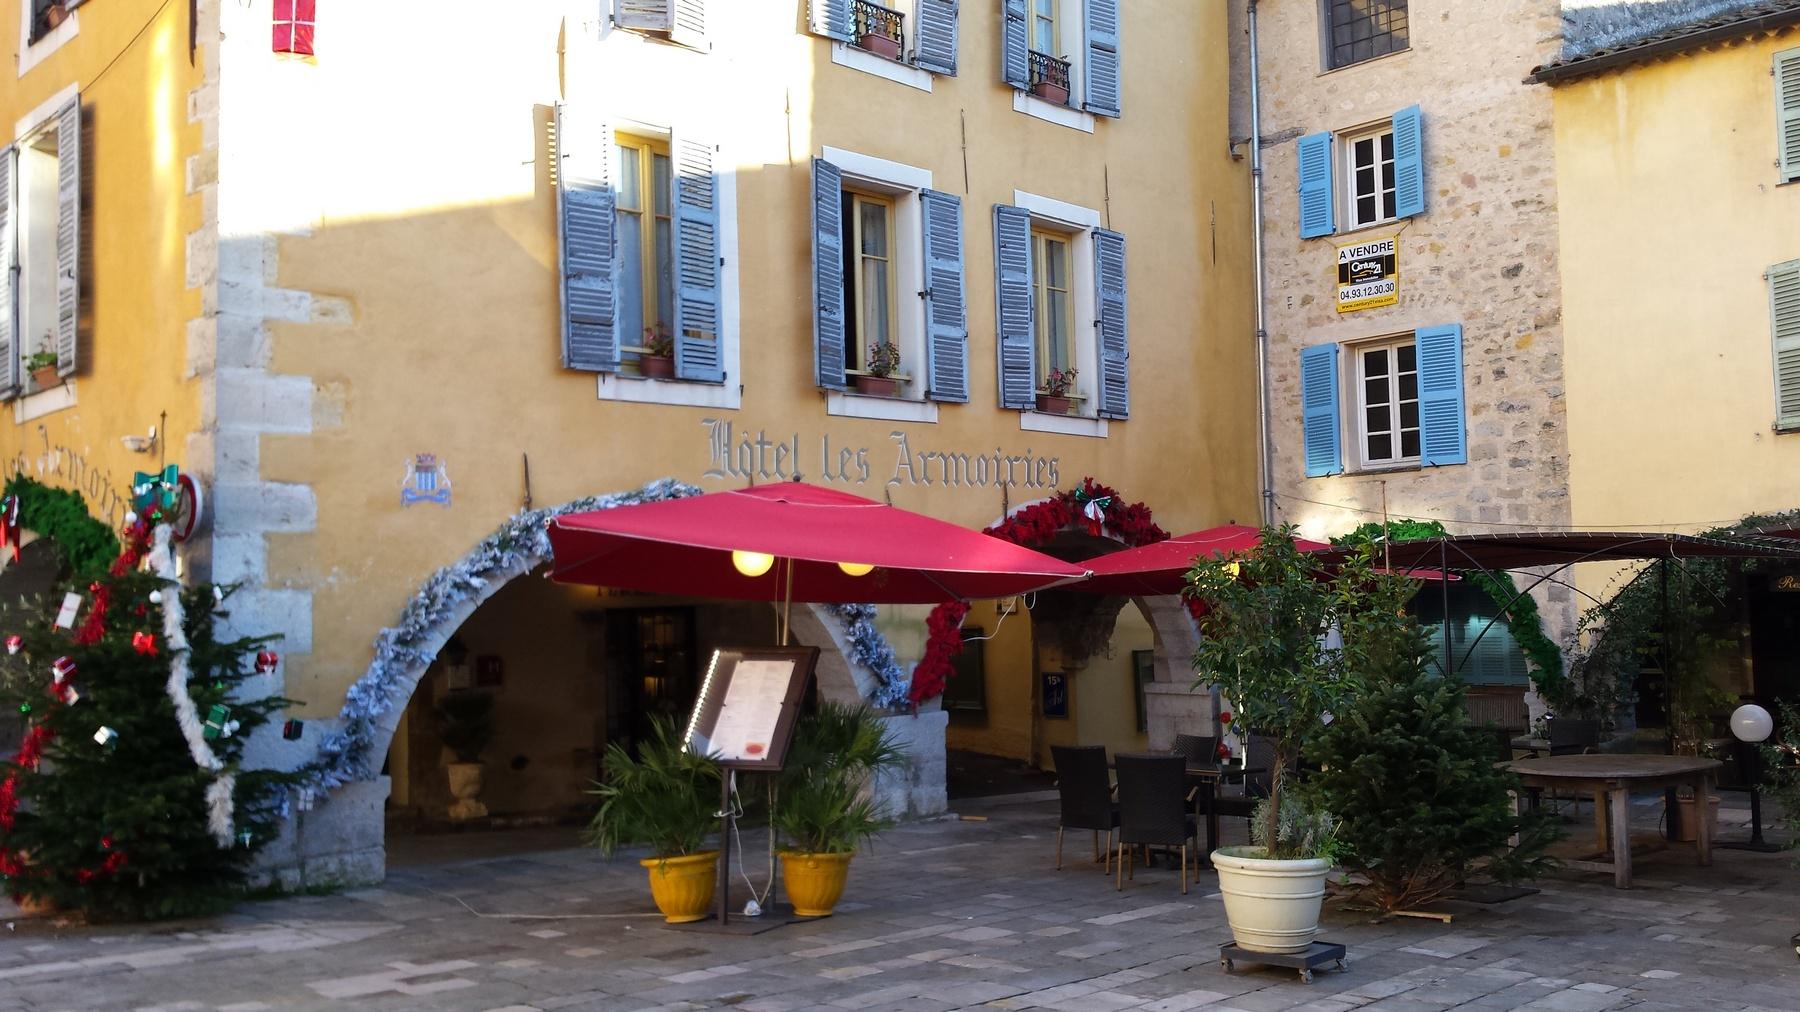 Hotel Valbonne - Hotel les Armoiries